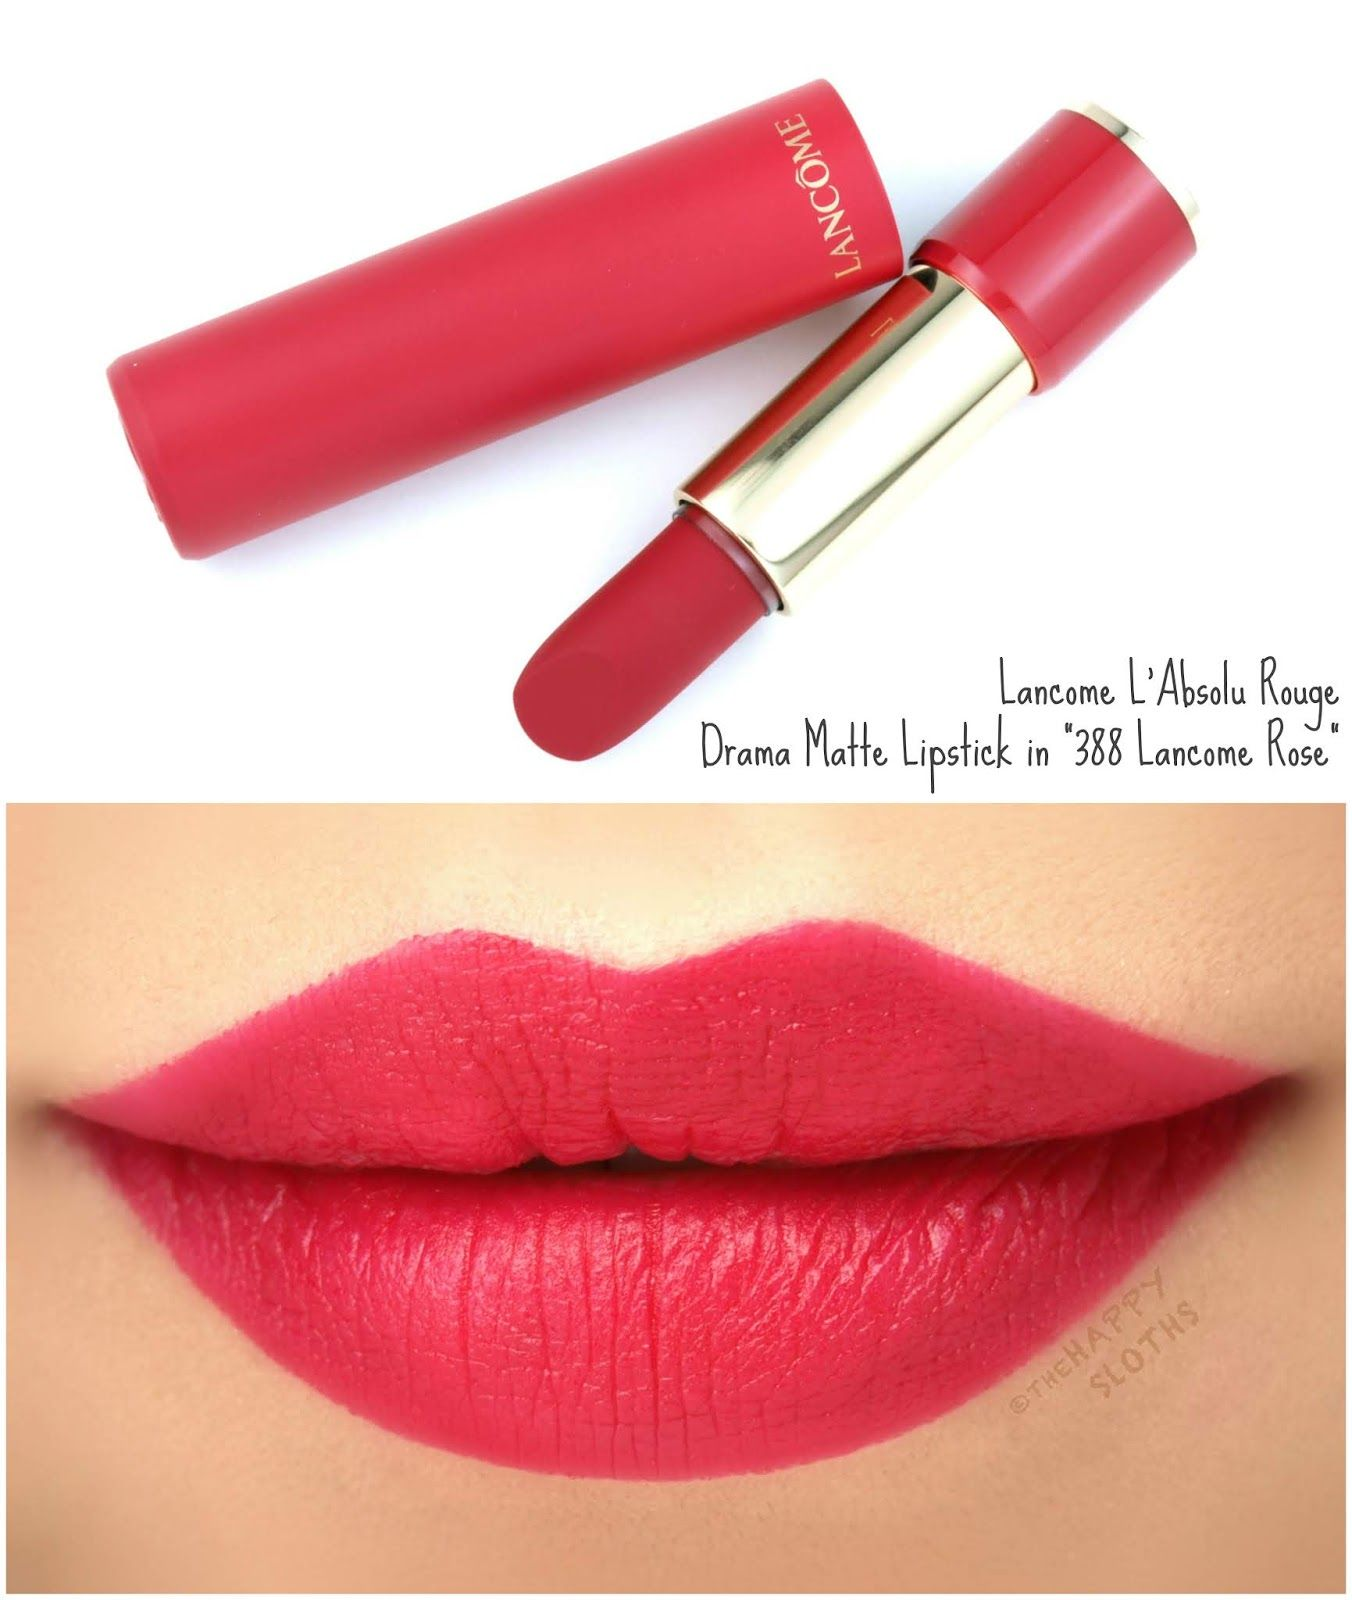 lancome vintage rose lipstick review